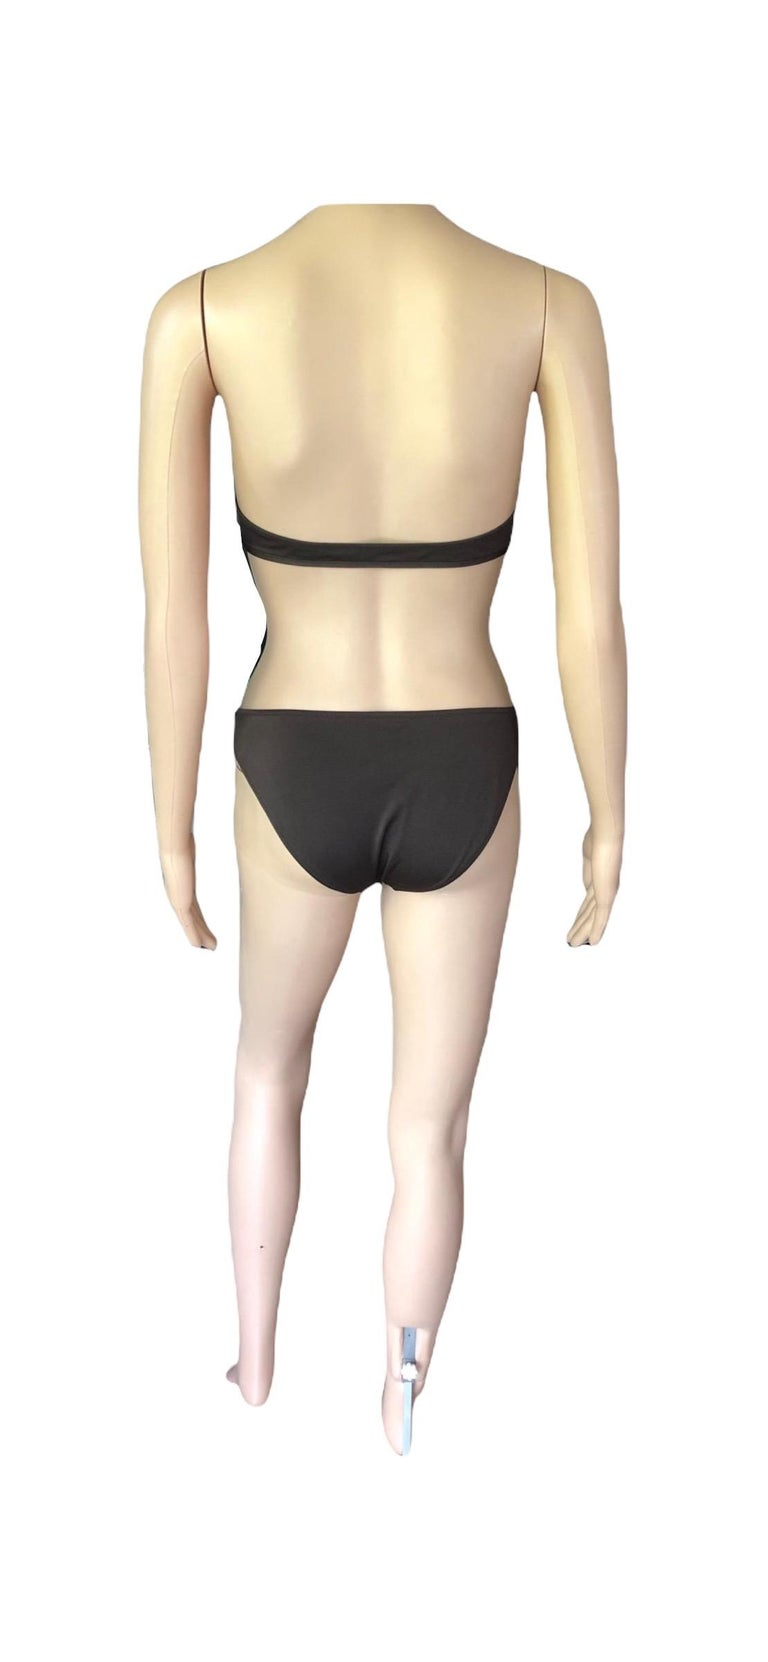 Dolce & Gabbana Logo Embellished Belted Brown Bikini Swimwear Swimsuit 2 Piece For Sale 6